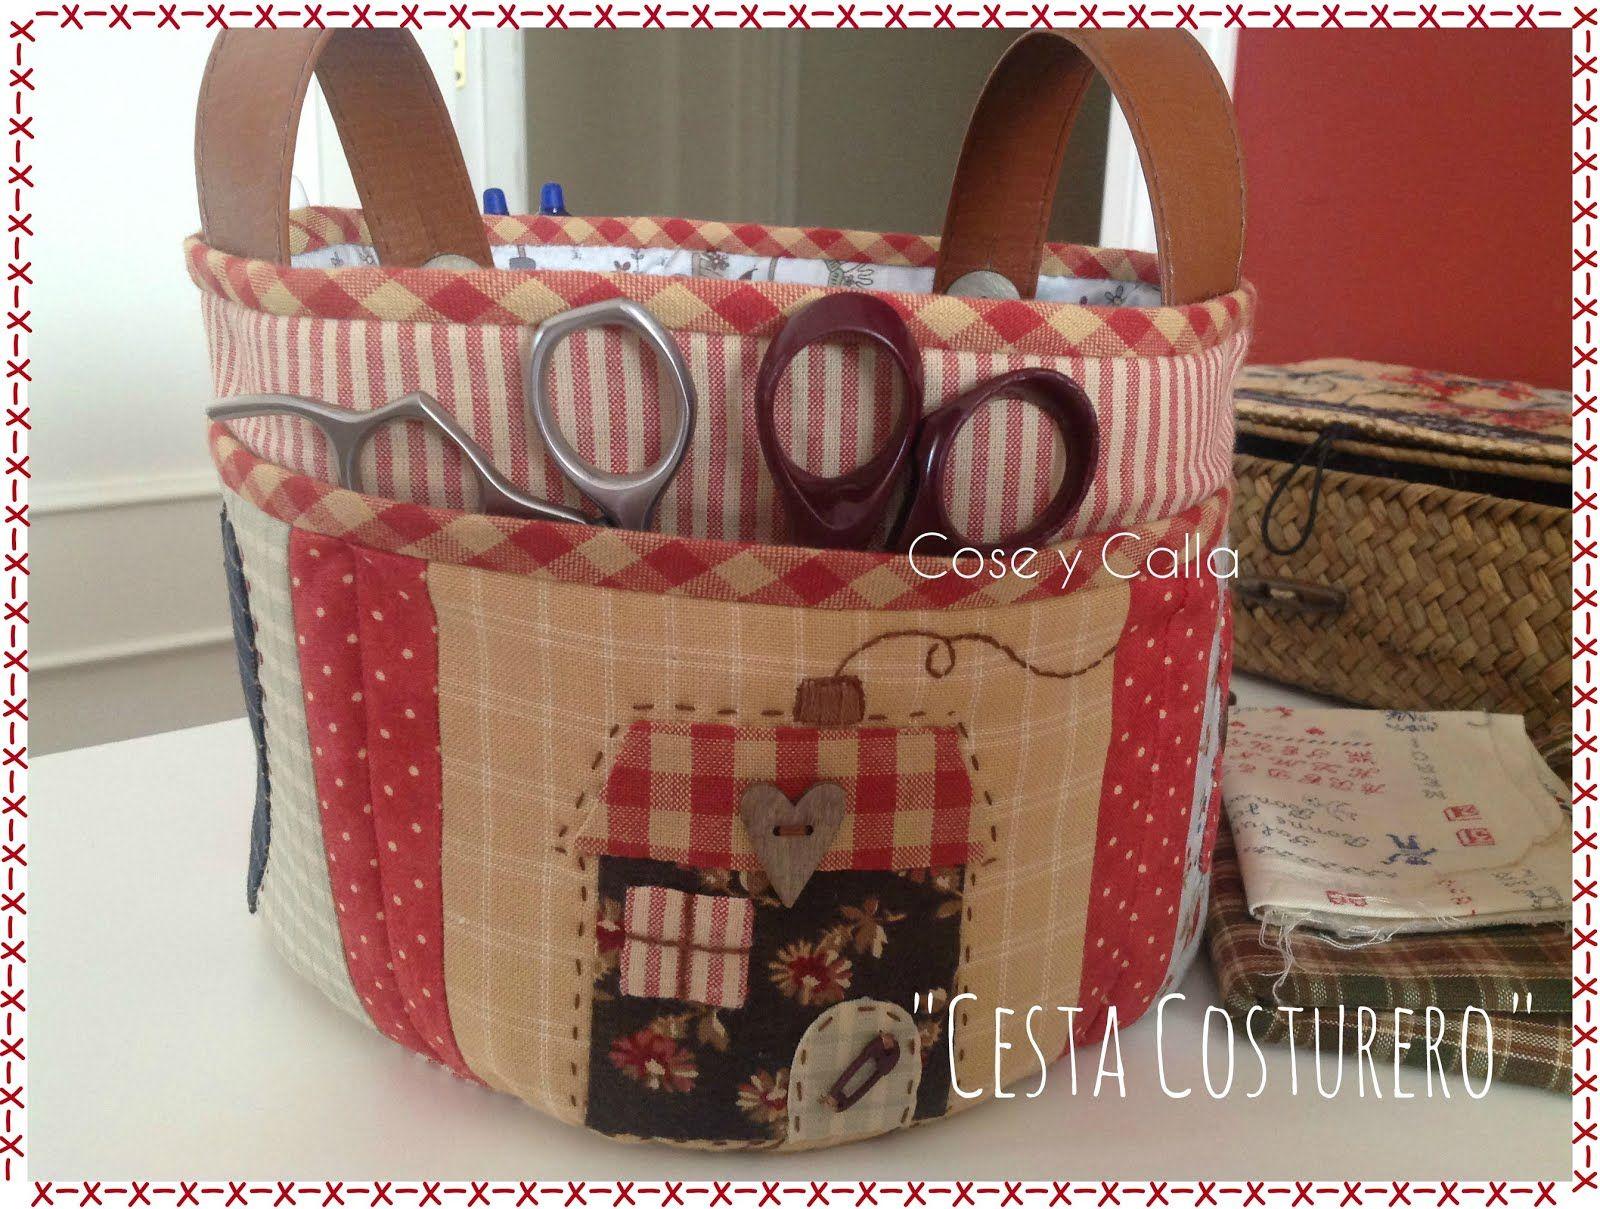 Cesta costurero costura pinterest cestas costura y - Manualidades patchwork bolsos ...